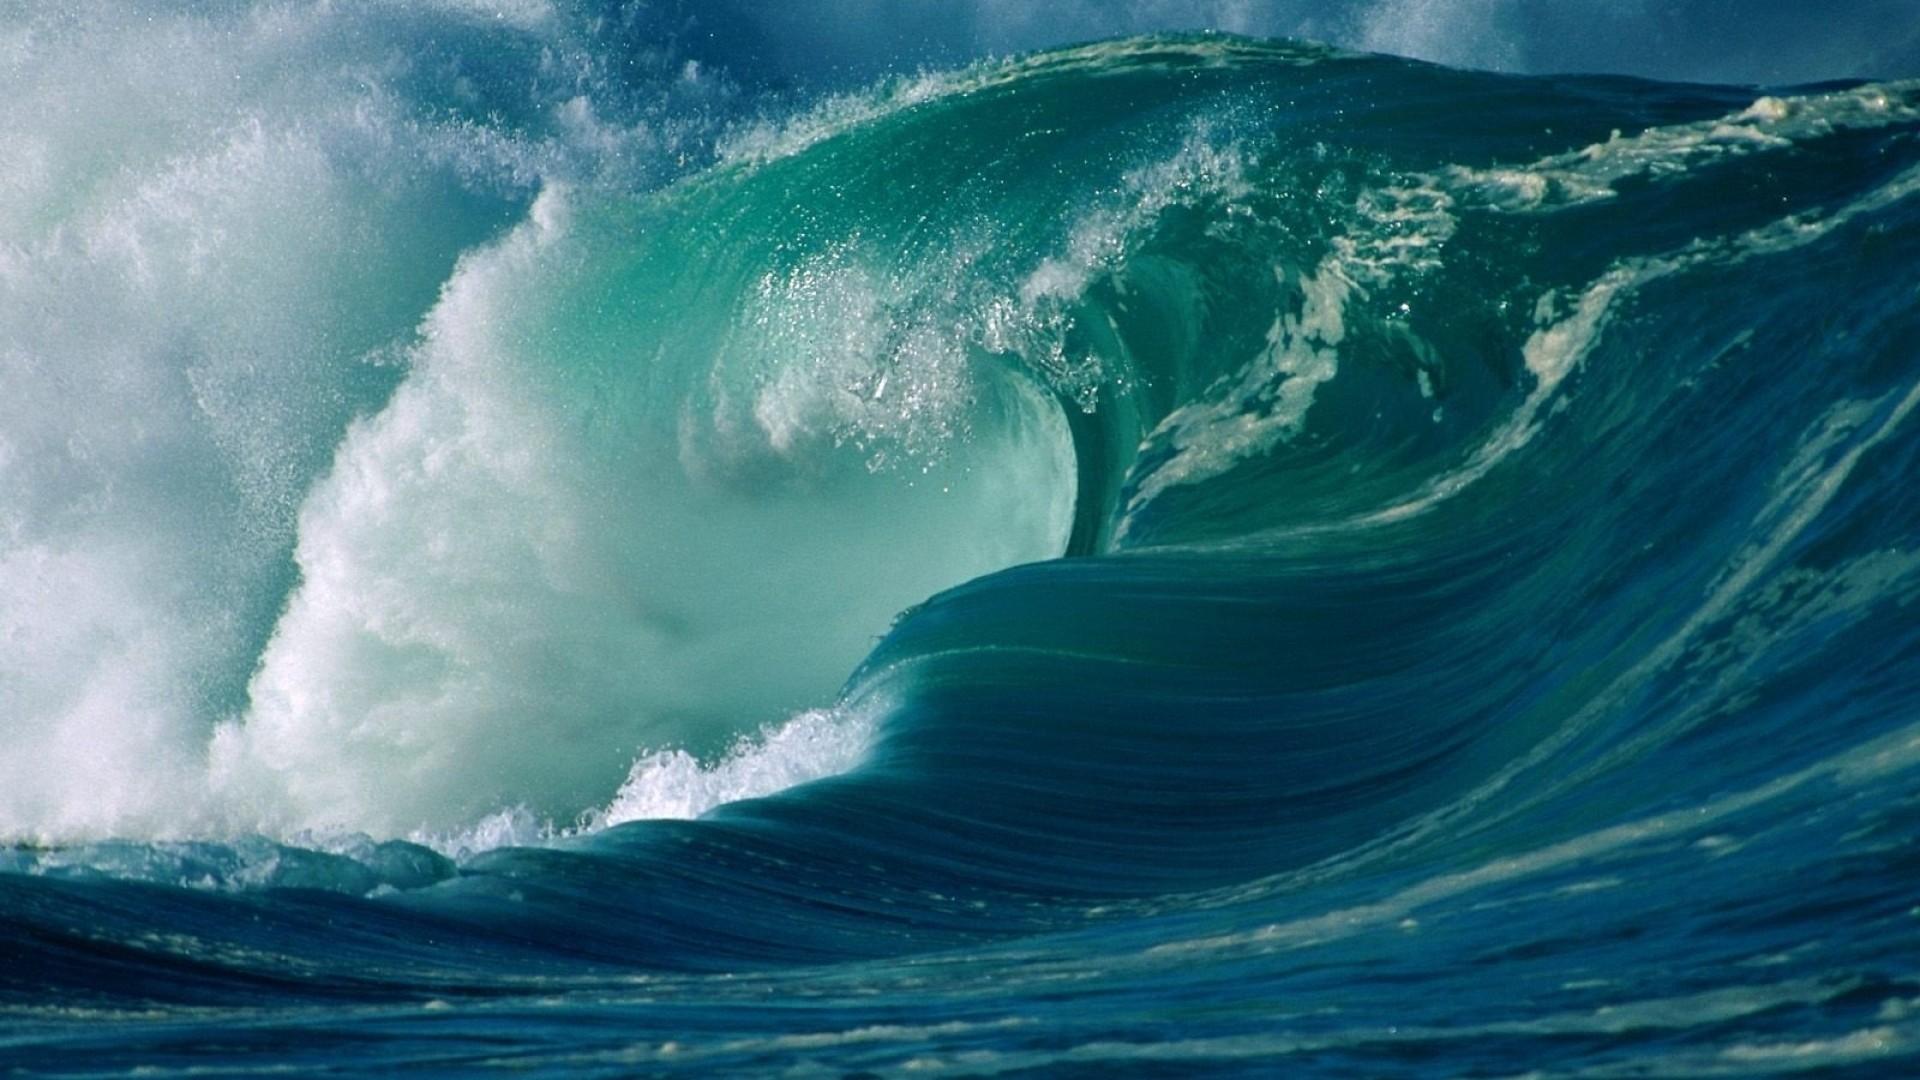 Wallpaper wave, elements, stream, ocean, hawaii